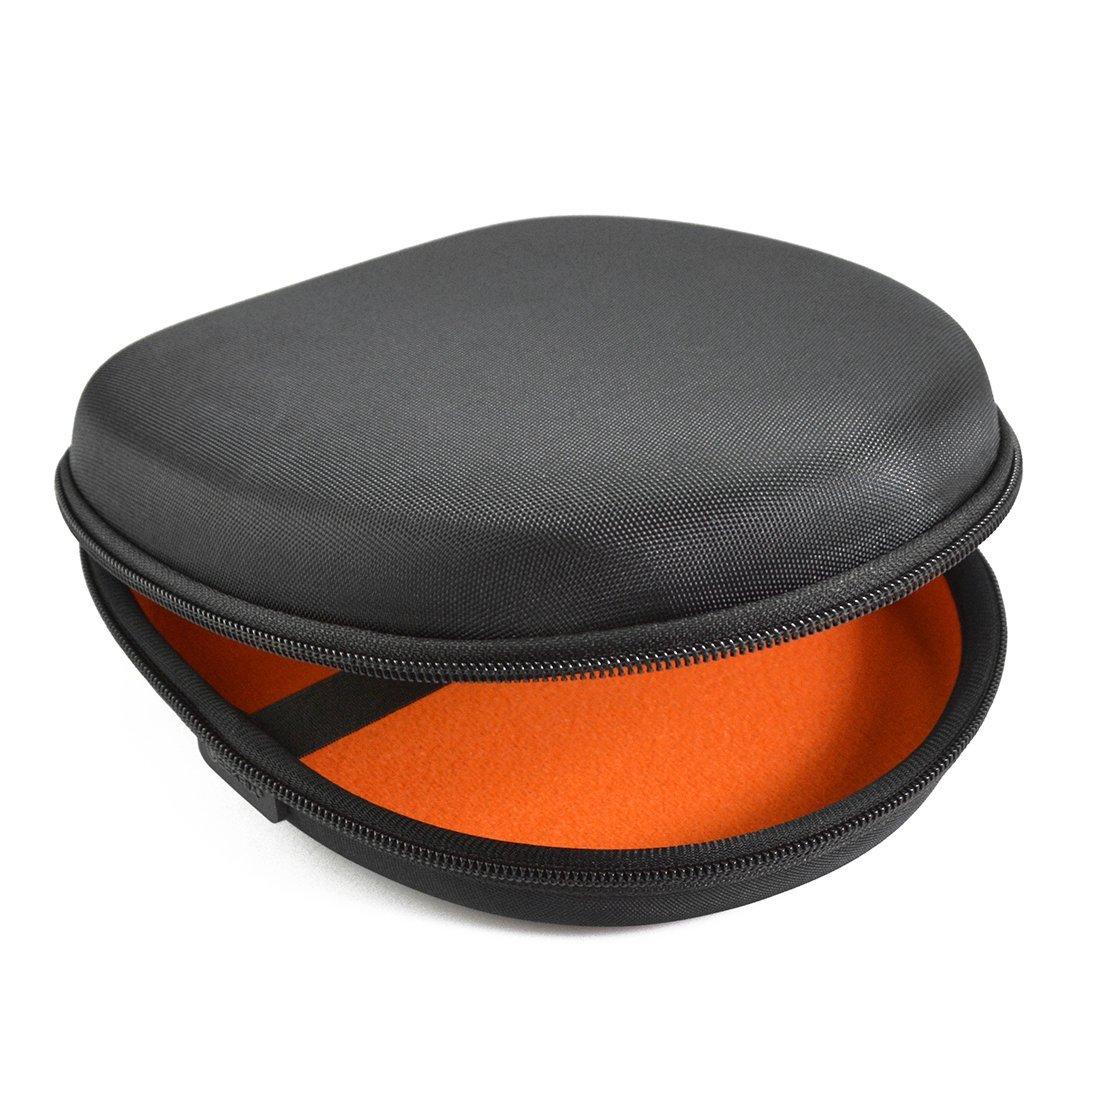 Geekria Headset Case for VXI BlueParrott B450-XT, B350-XT, B250-XT, B250-XTS, Voiinoiu, Arkey burds, Mpow Pro, Truck Driver, Call Center Headphone/Hard Shell Carrying Case/Protective Travel Bag EJB29-09